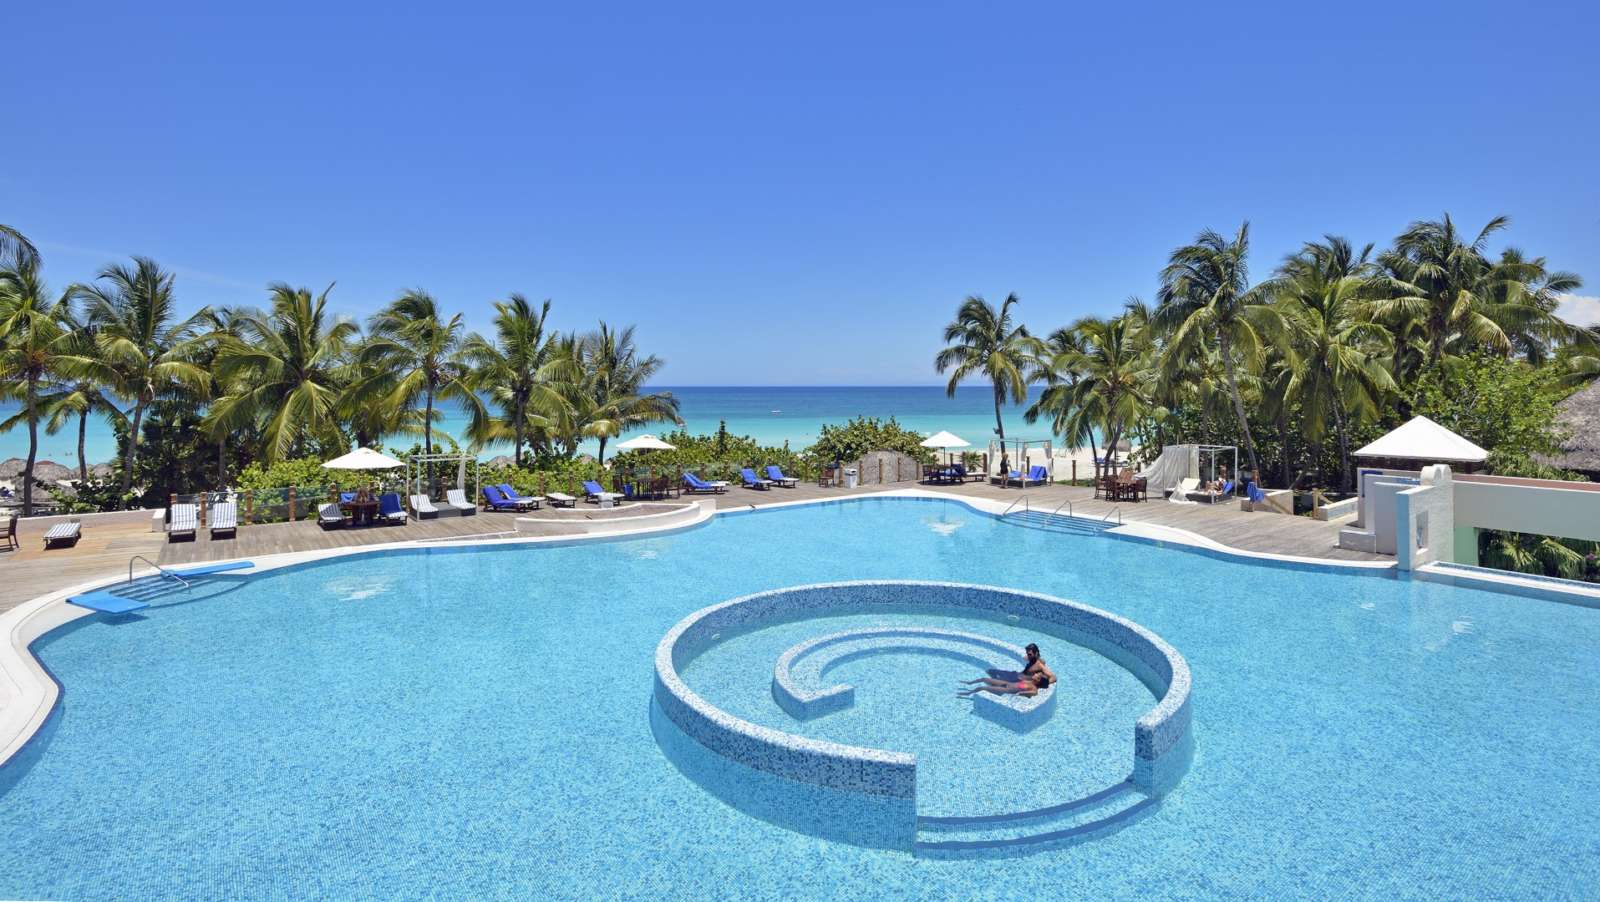 Melia Las Americas Hotel Swimming Pool